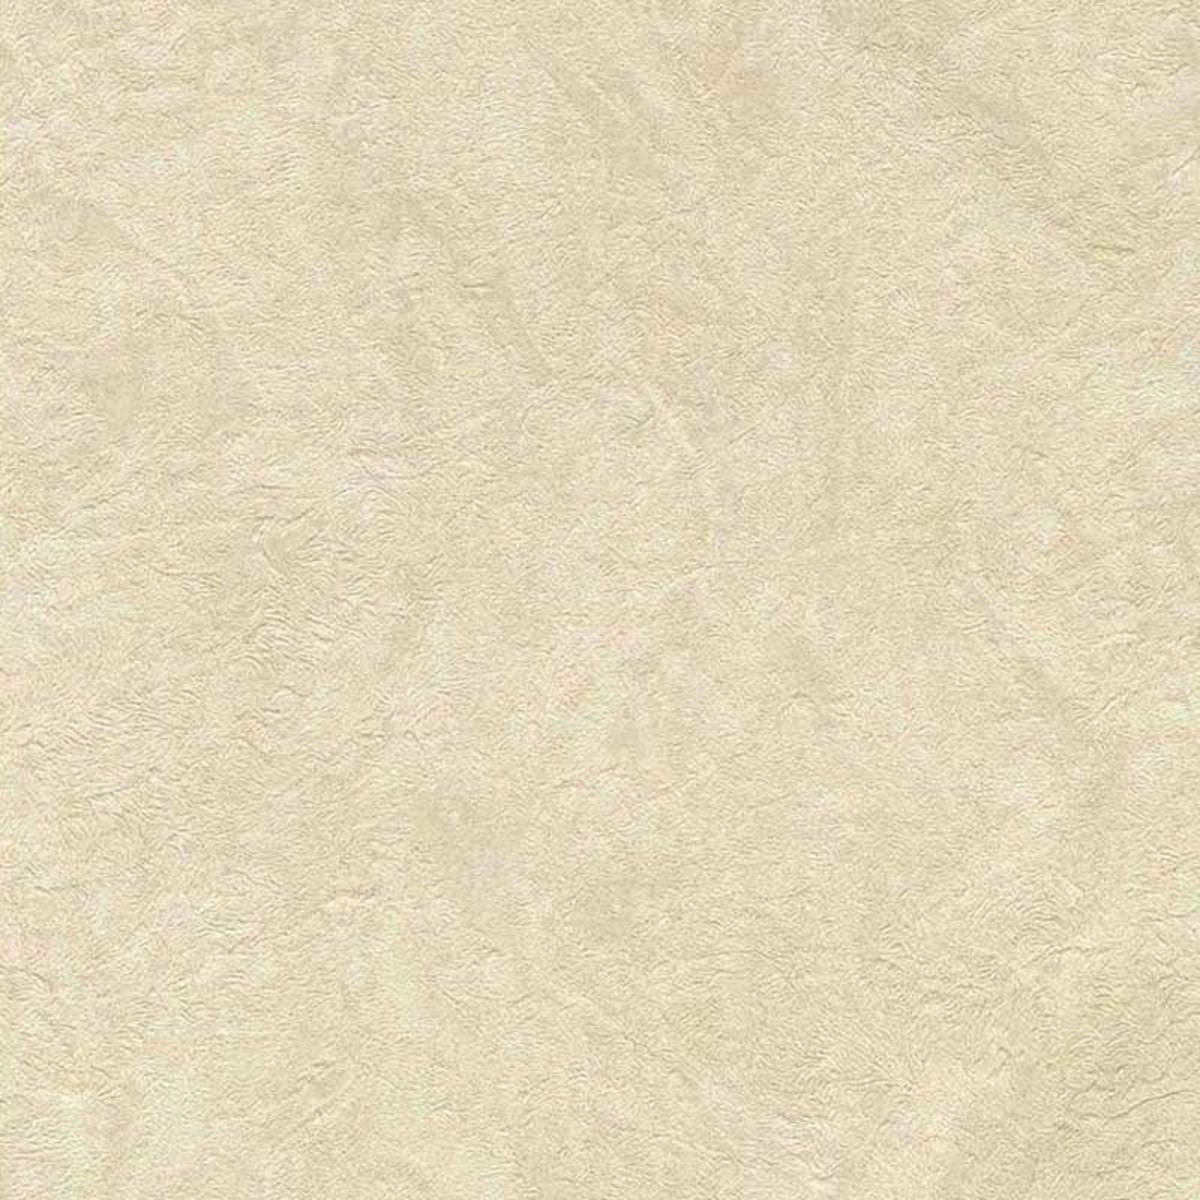 Обои флизелиновые Decori-Decori Alta Classe бежевые 1.06 м 81862